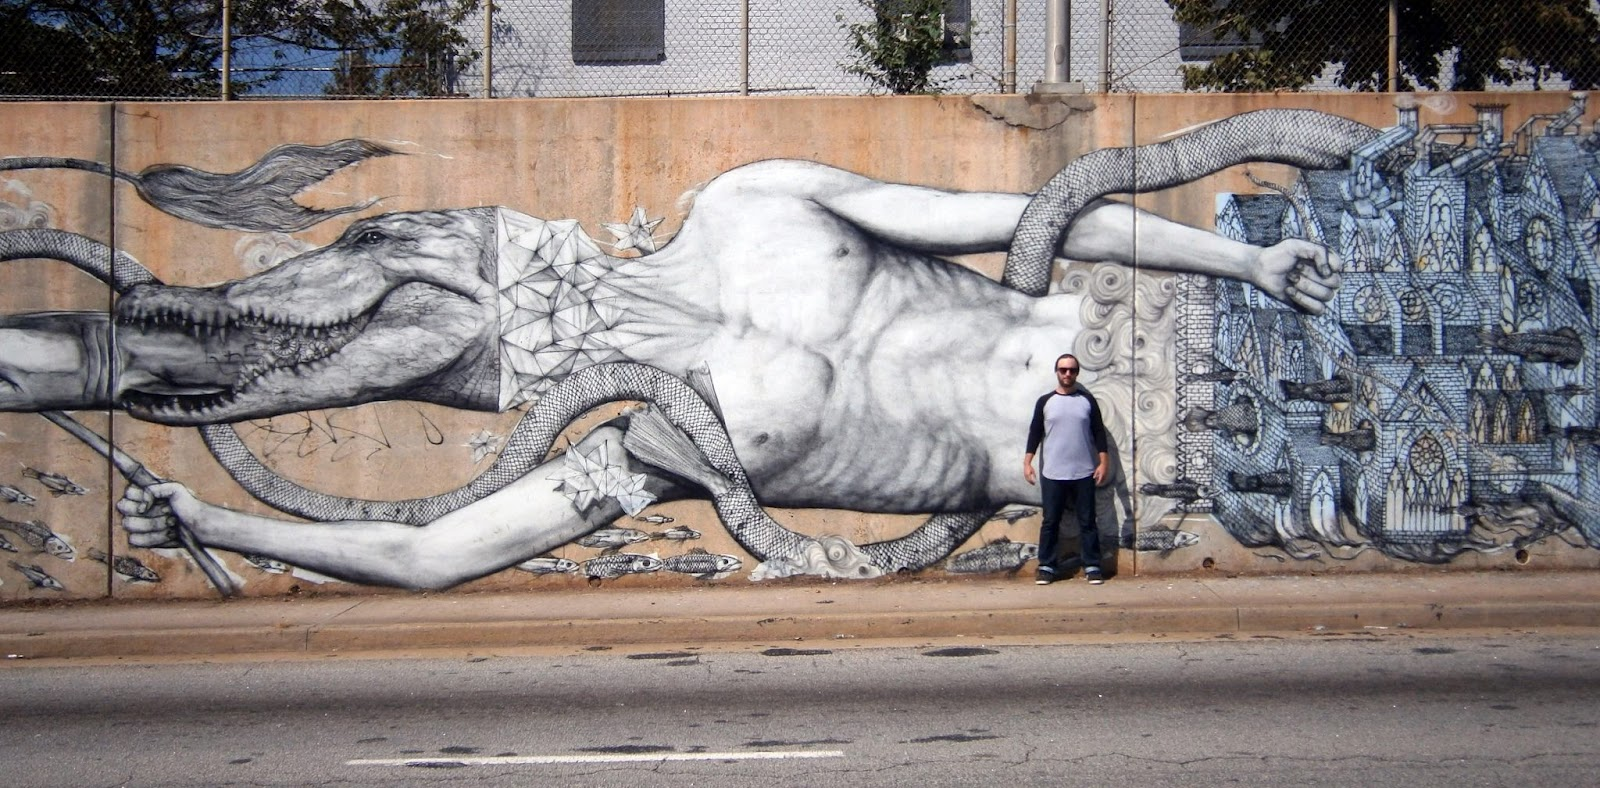 Roti new mural in atlanta usa streetartnews streetartnews for Mural street art